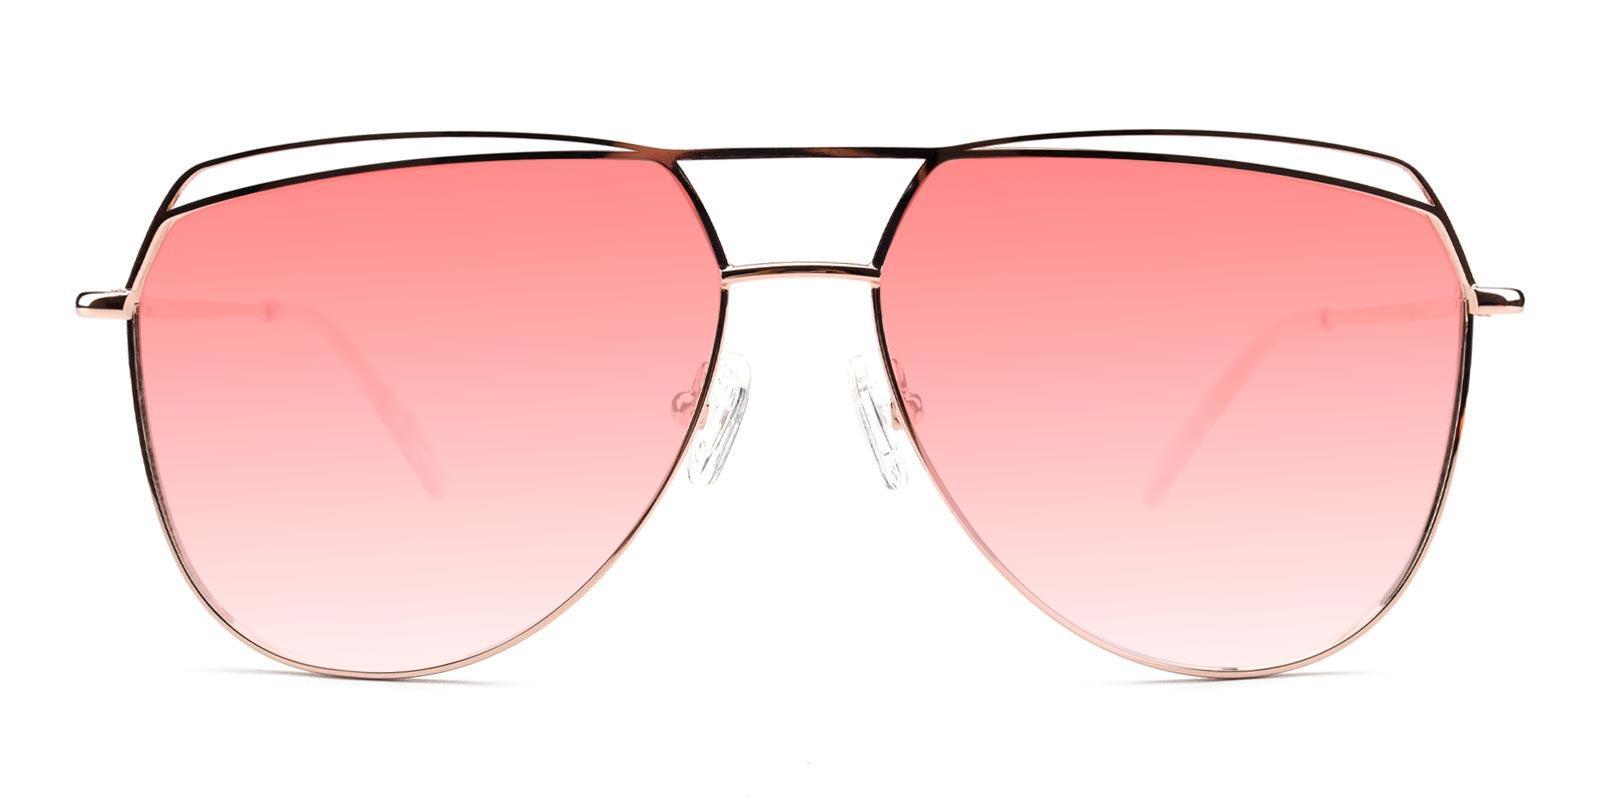 Acto-Pink-Aviator-Metal-Sunglasses-additional2